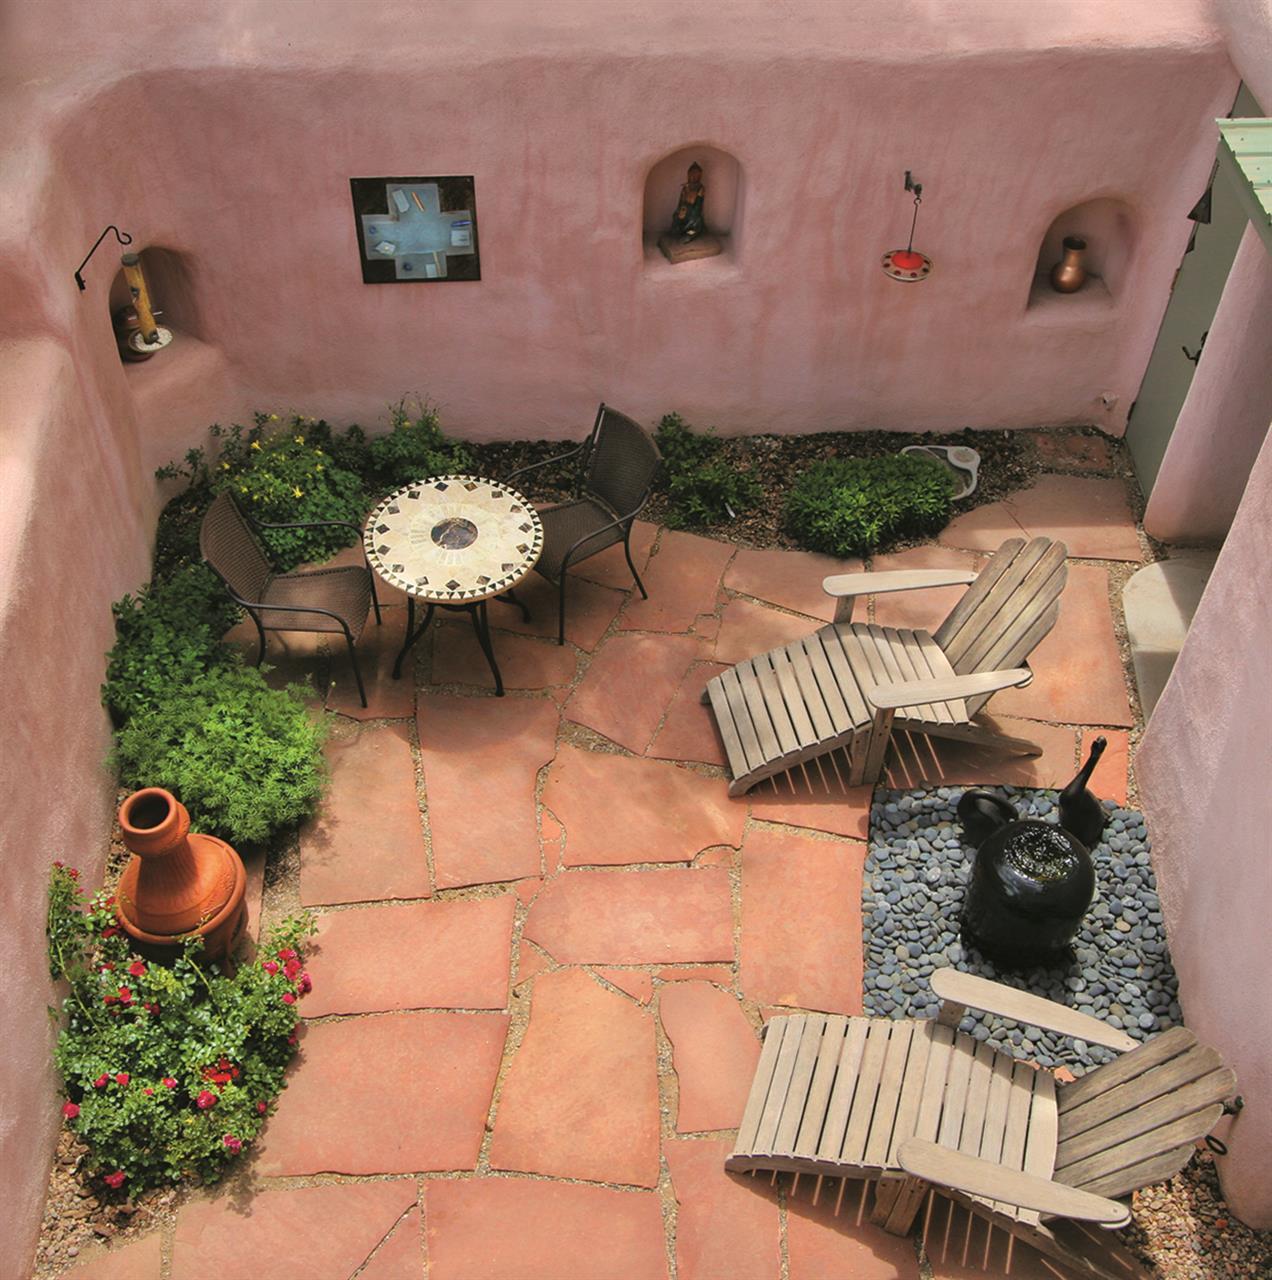 #Taos culture #adobe courtyard #Taos #New Mexico